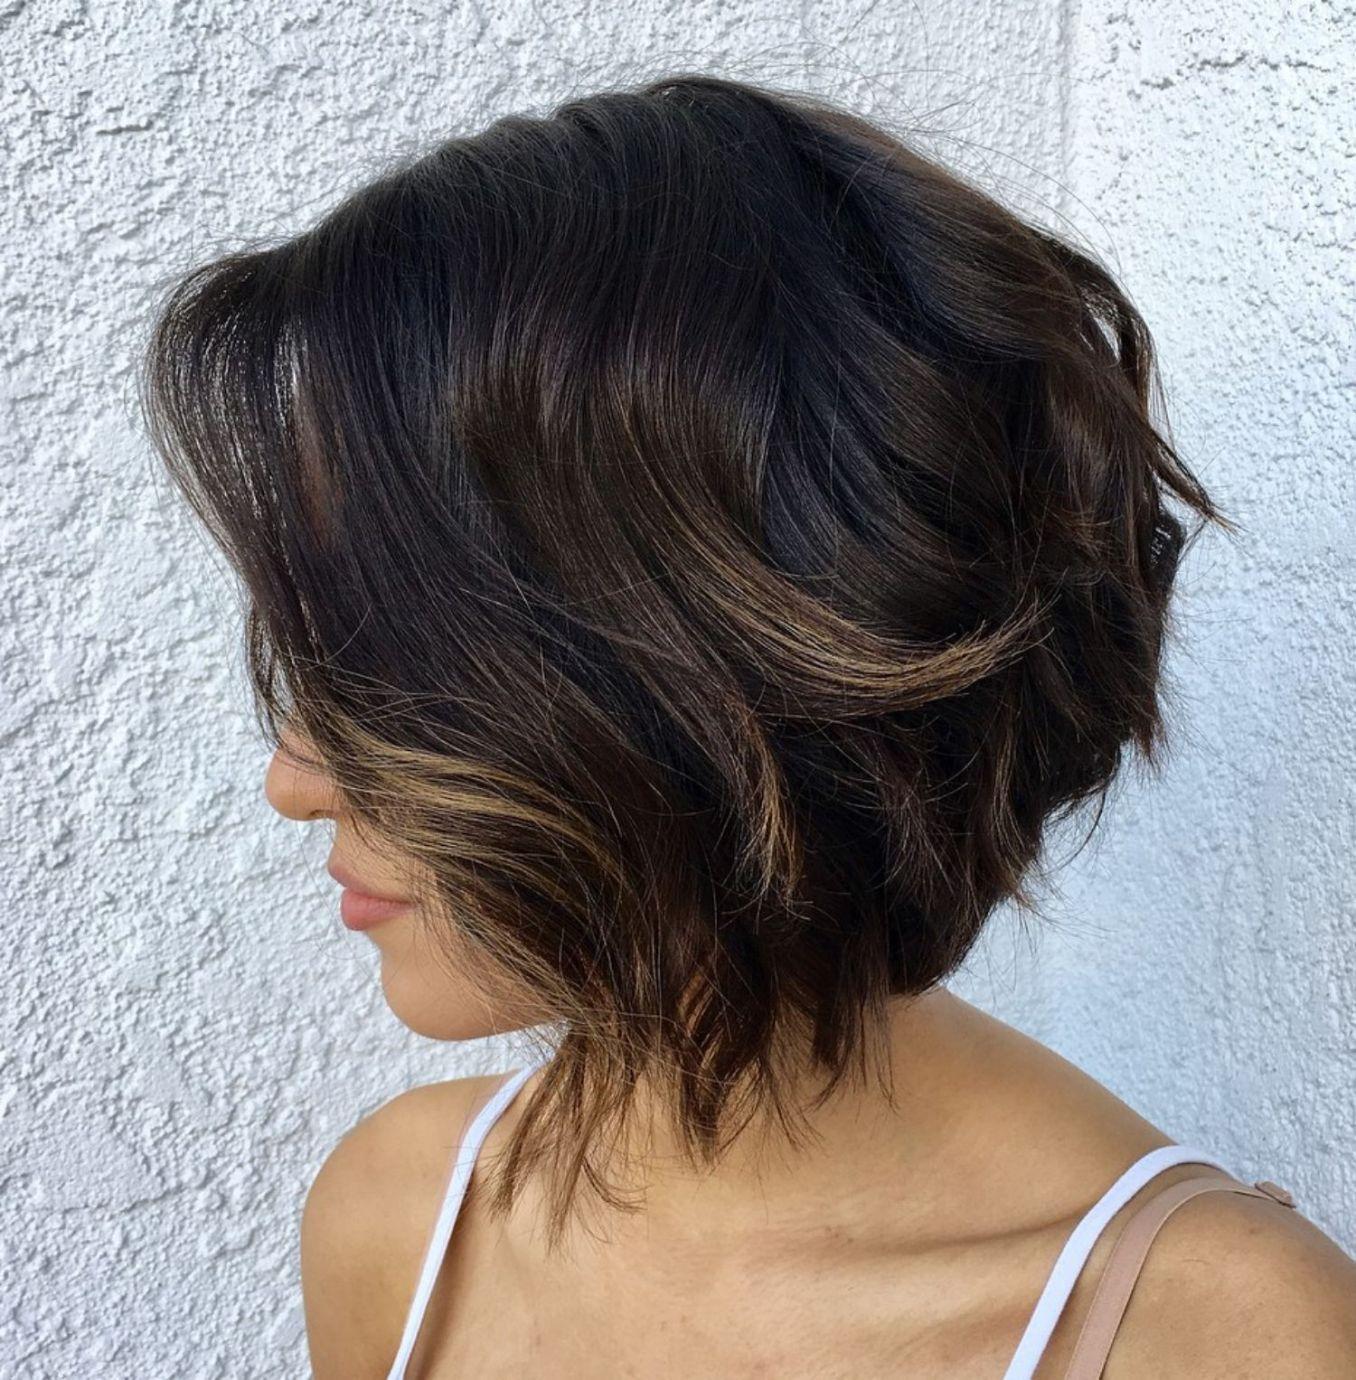 50 Trendy Inverted Bob Haircuts In 2020 Short Hair With Layers Wavy Bob Hairstyles Choppy Bob Hairstyles